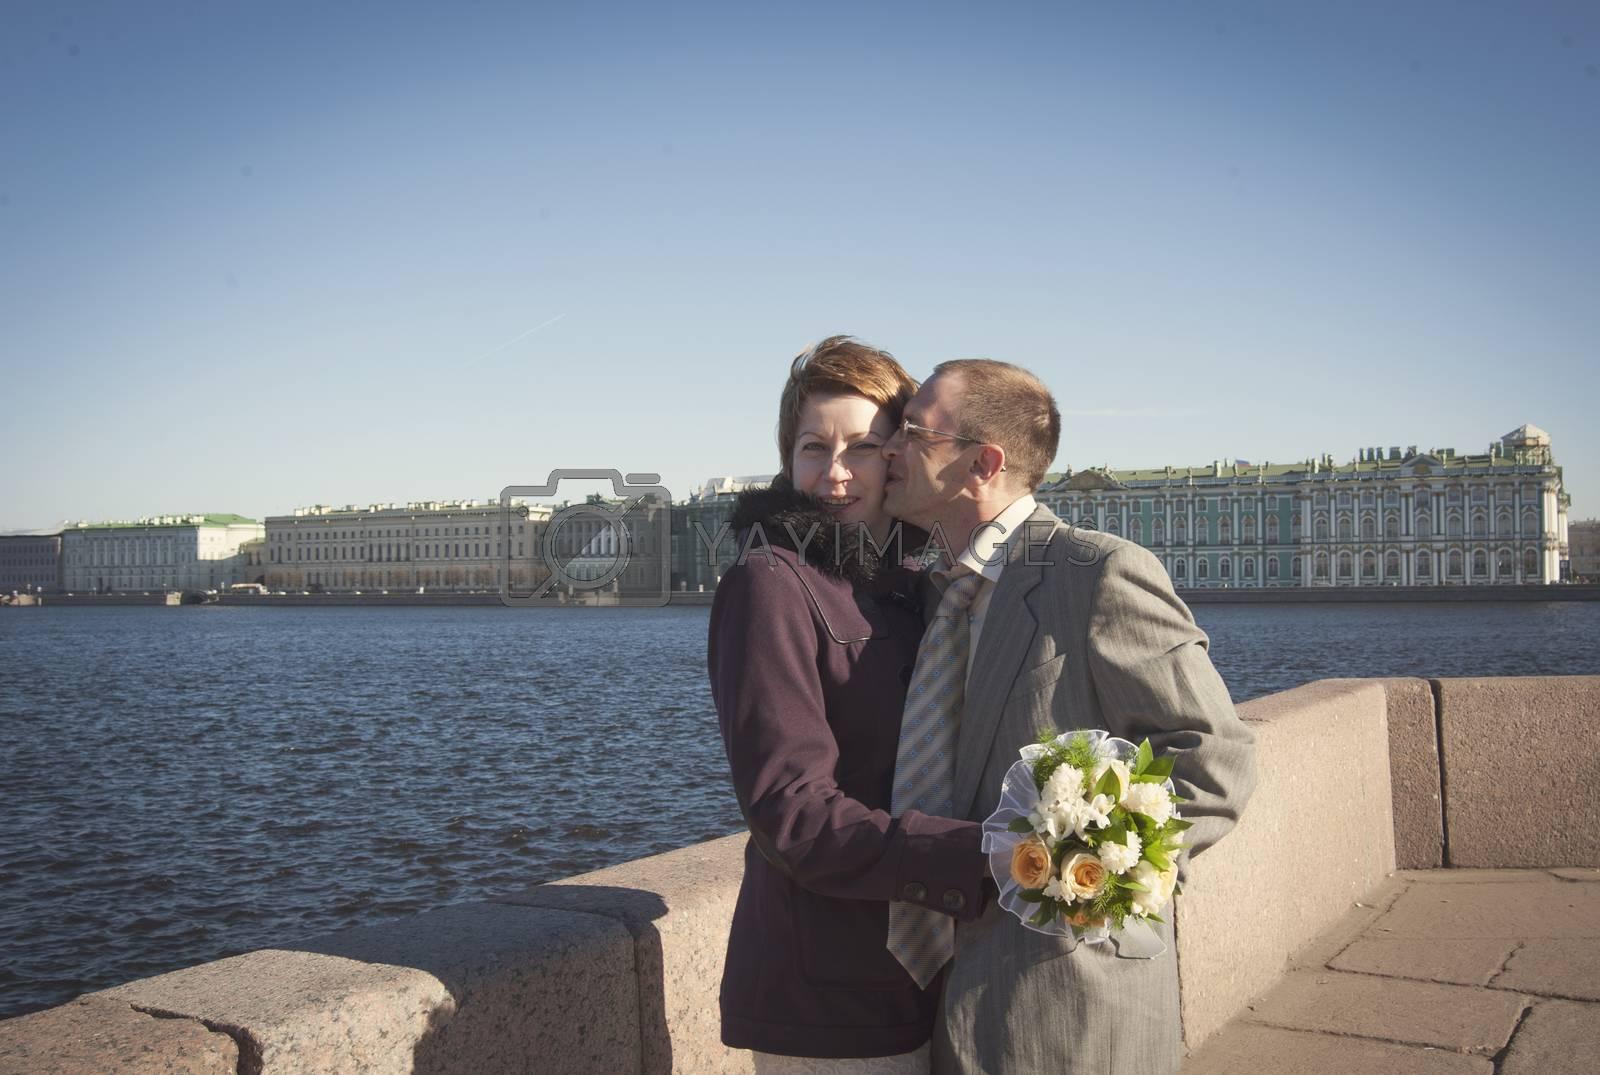 Royalty free image of happy couple by raduga21